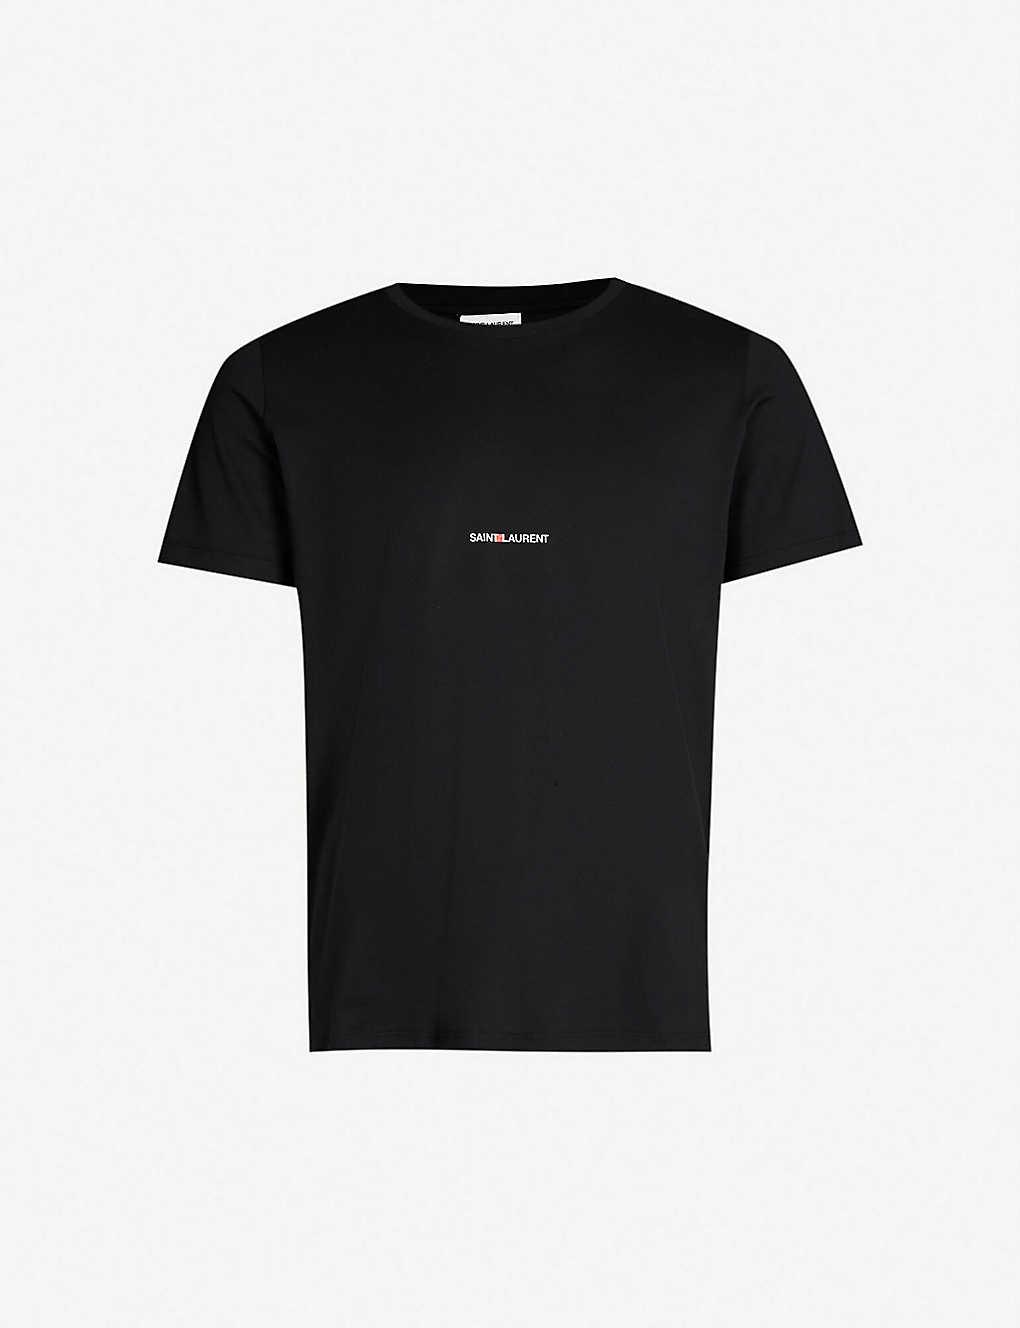 5334a7e1 SAINT LAURENT - Logo-print cotton-jersey T-shirt | Selfridges.com